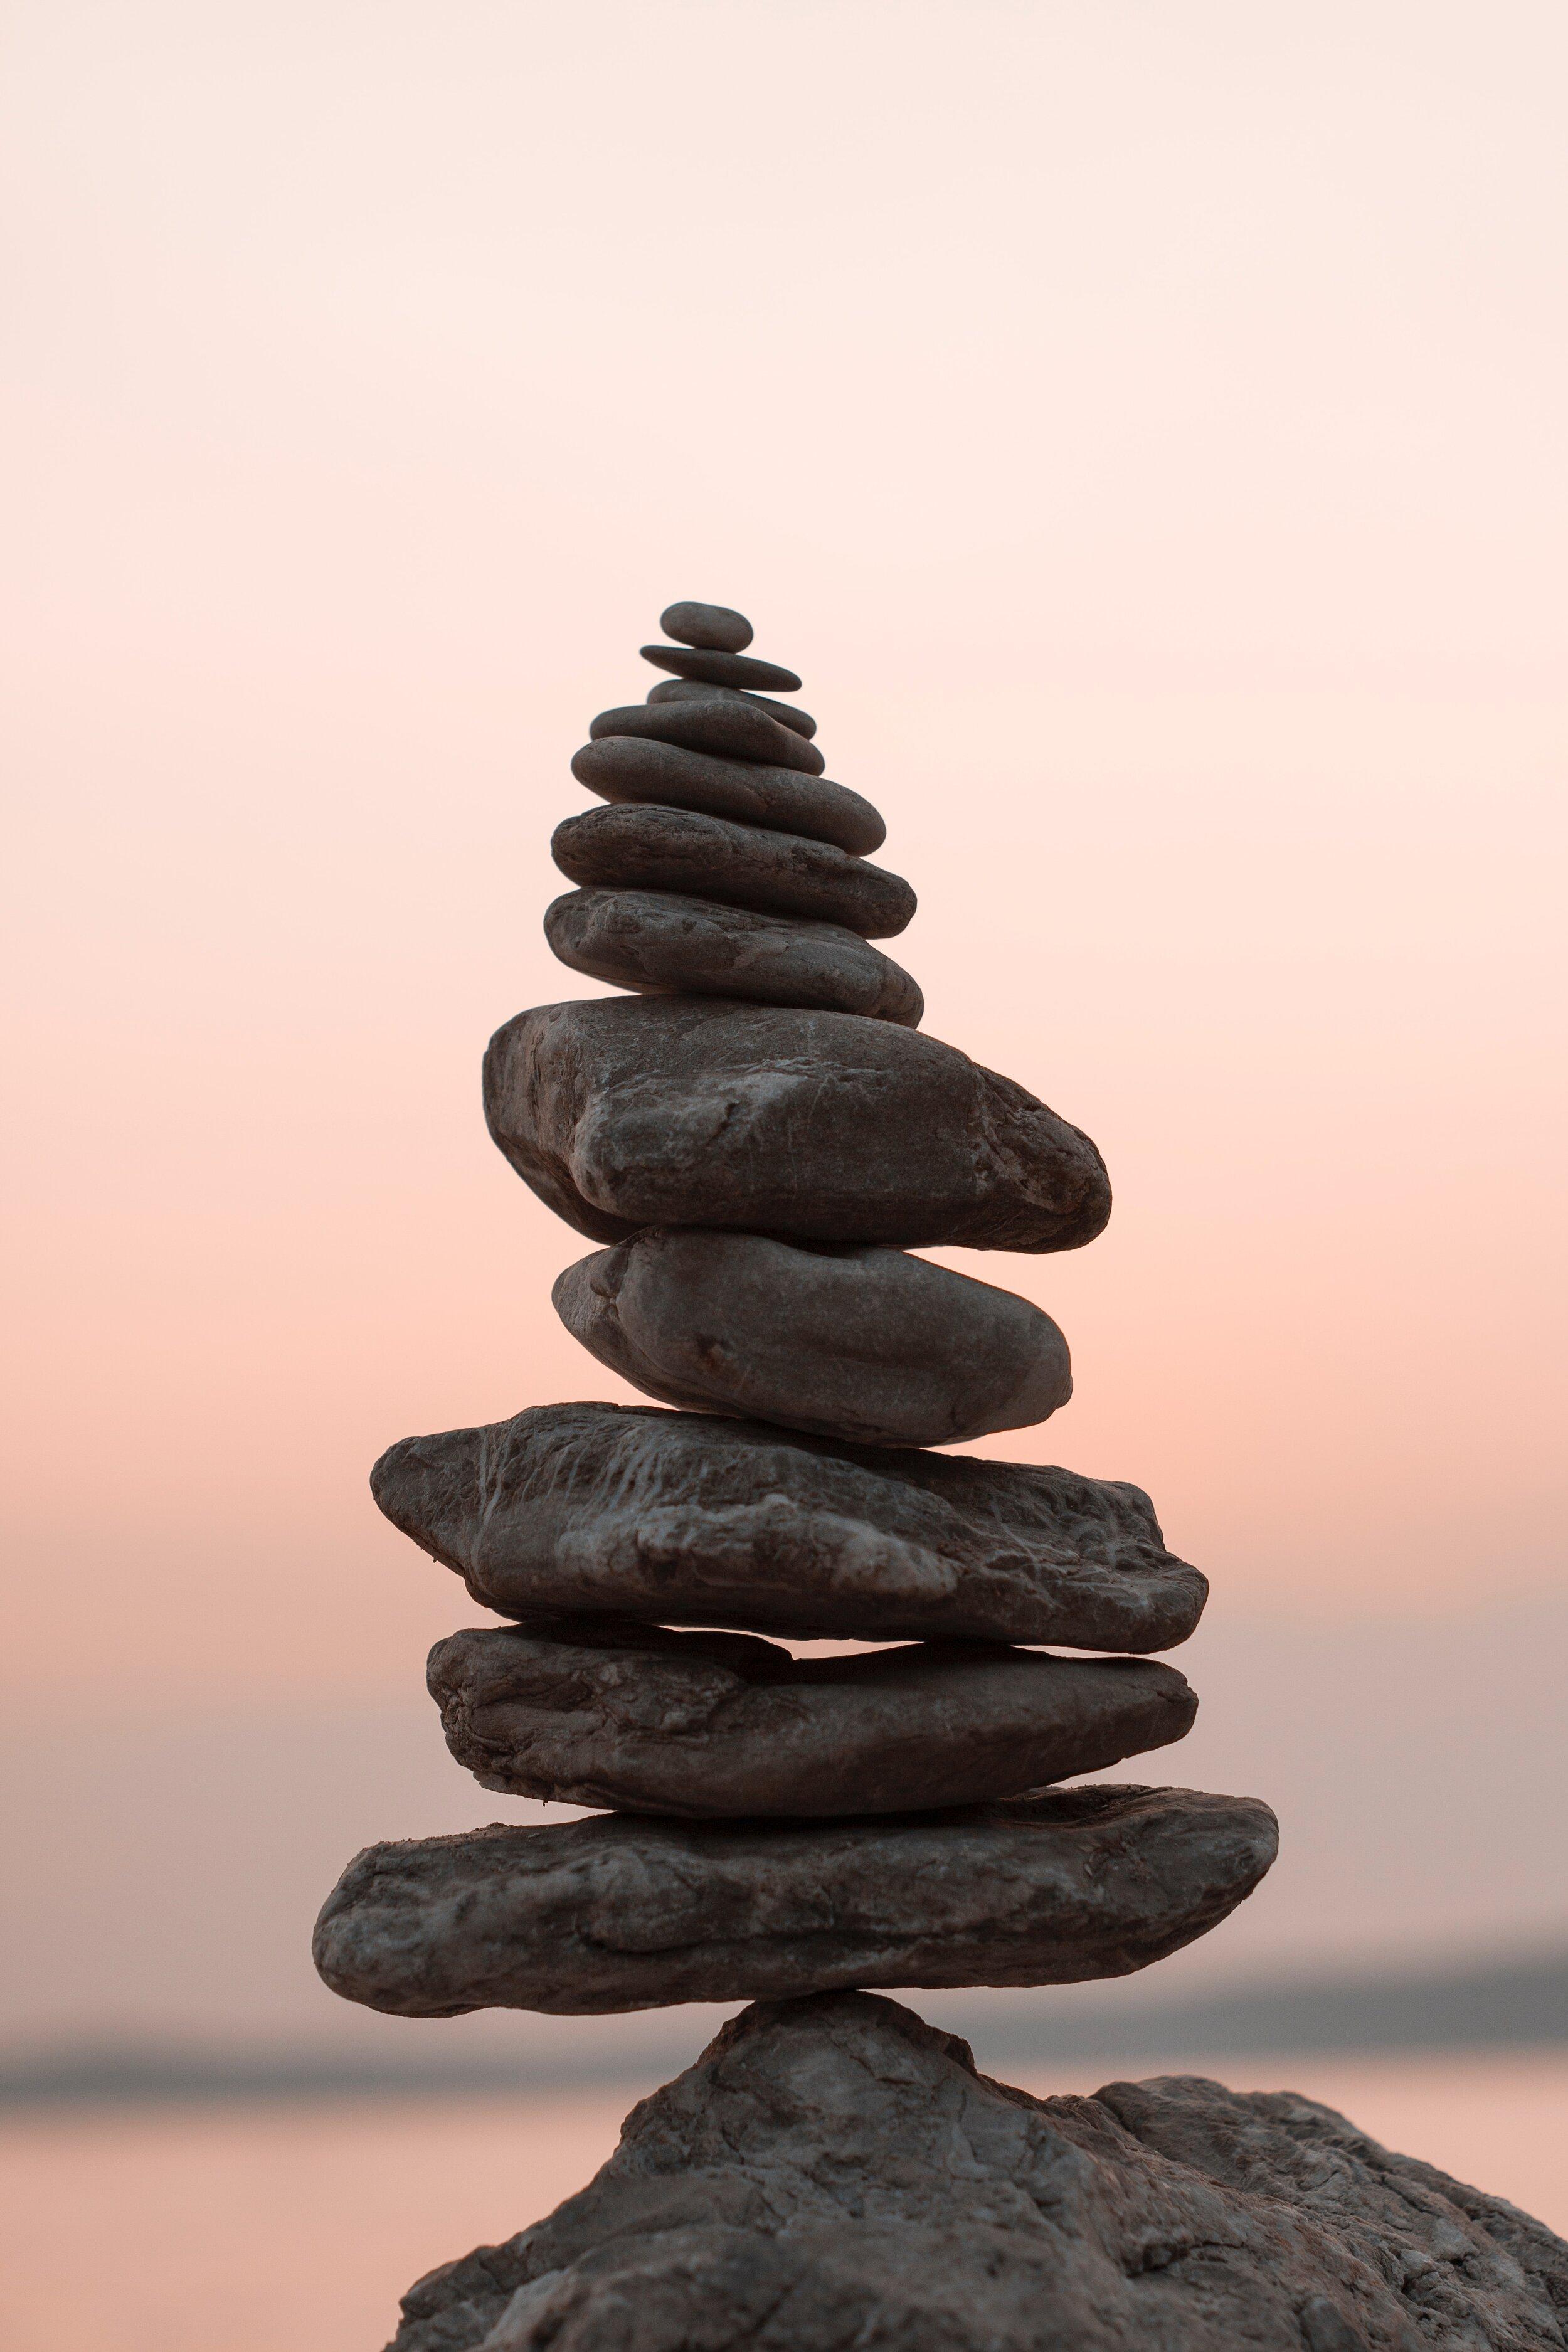 Image Description: A tower of stones balancing